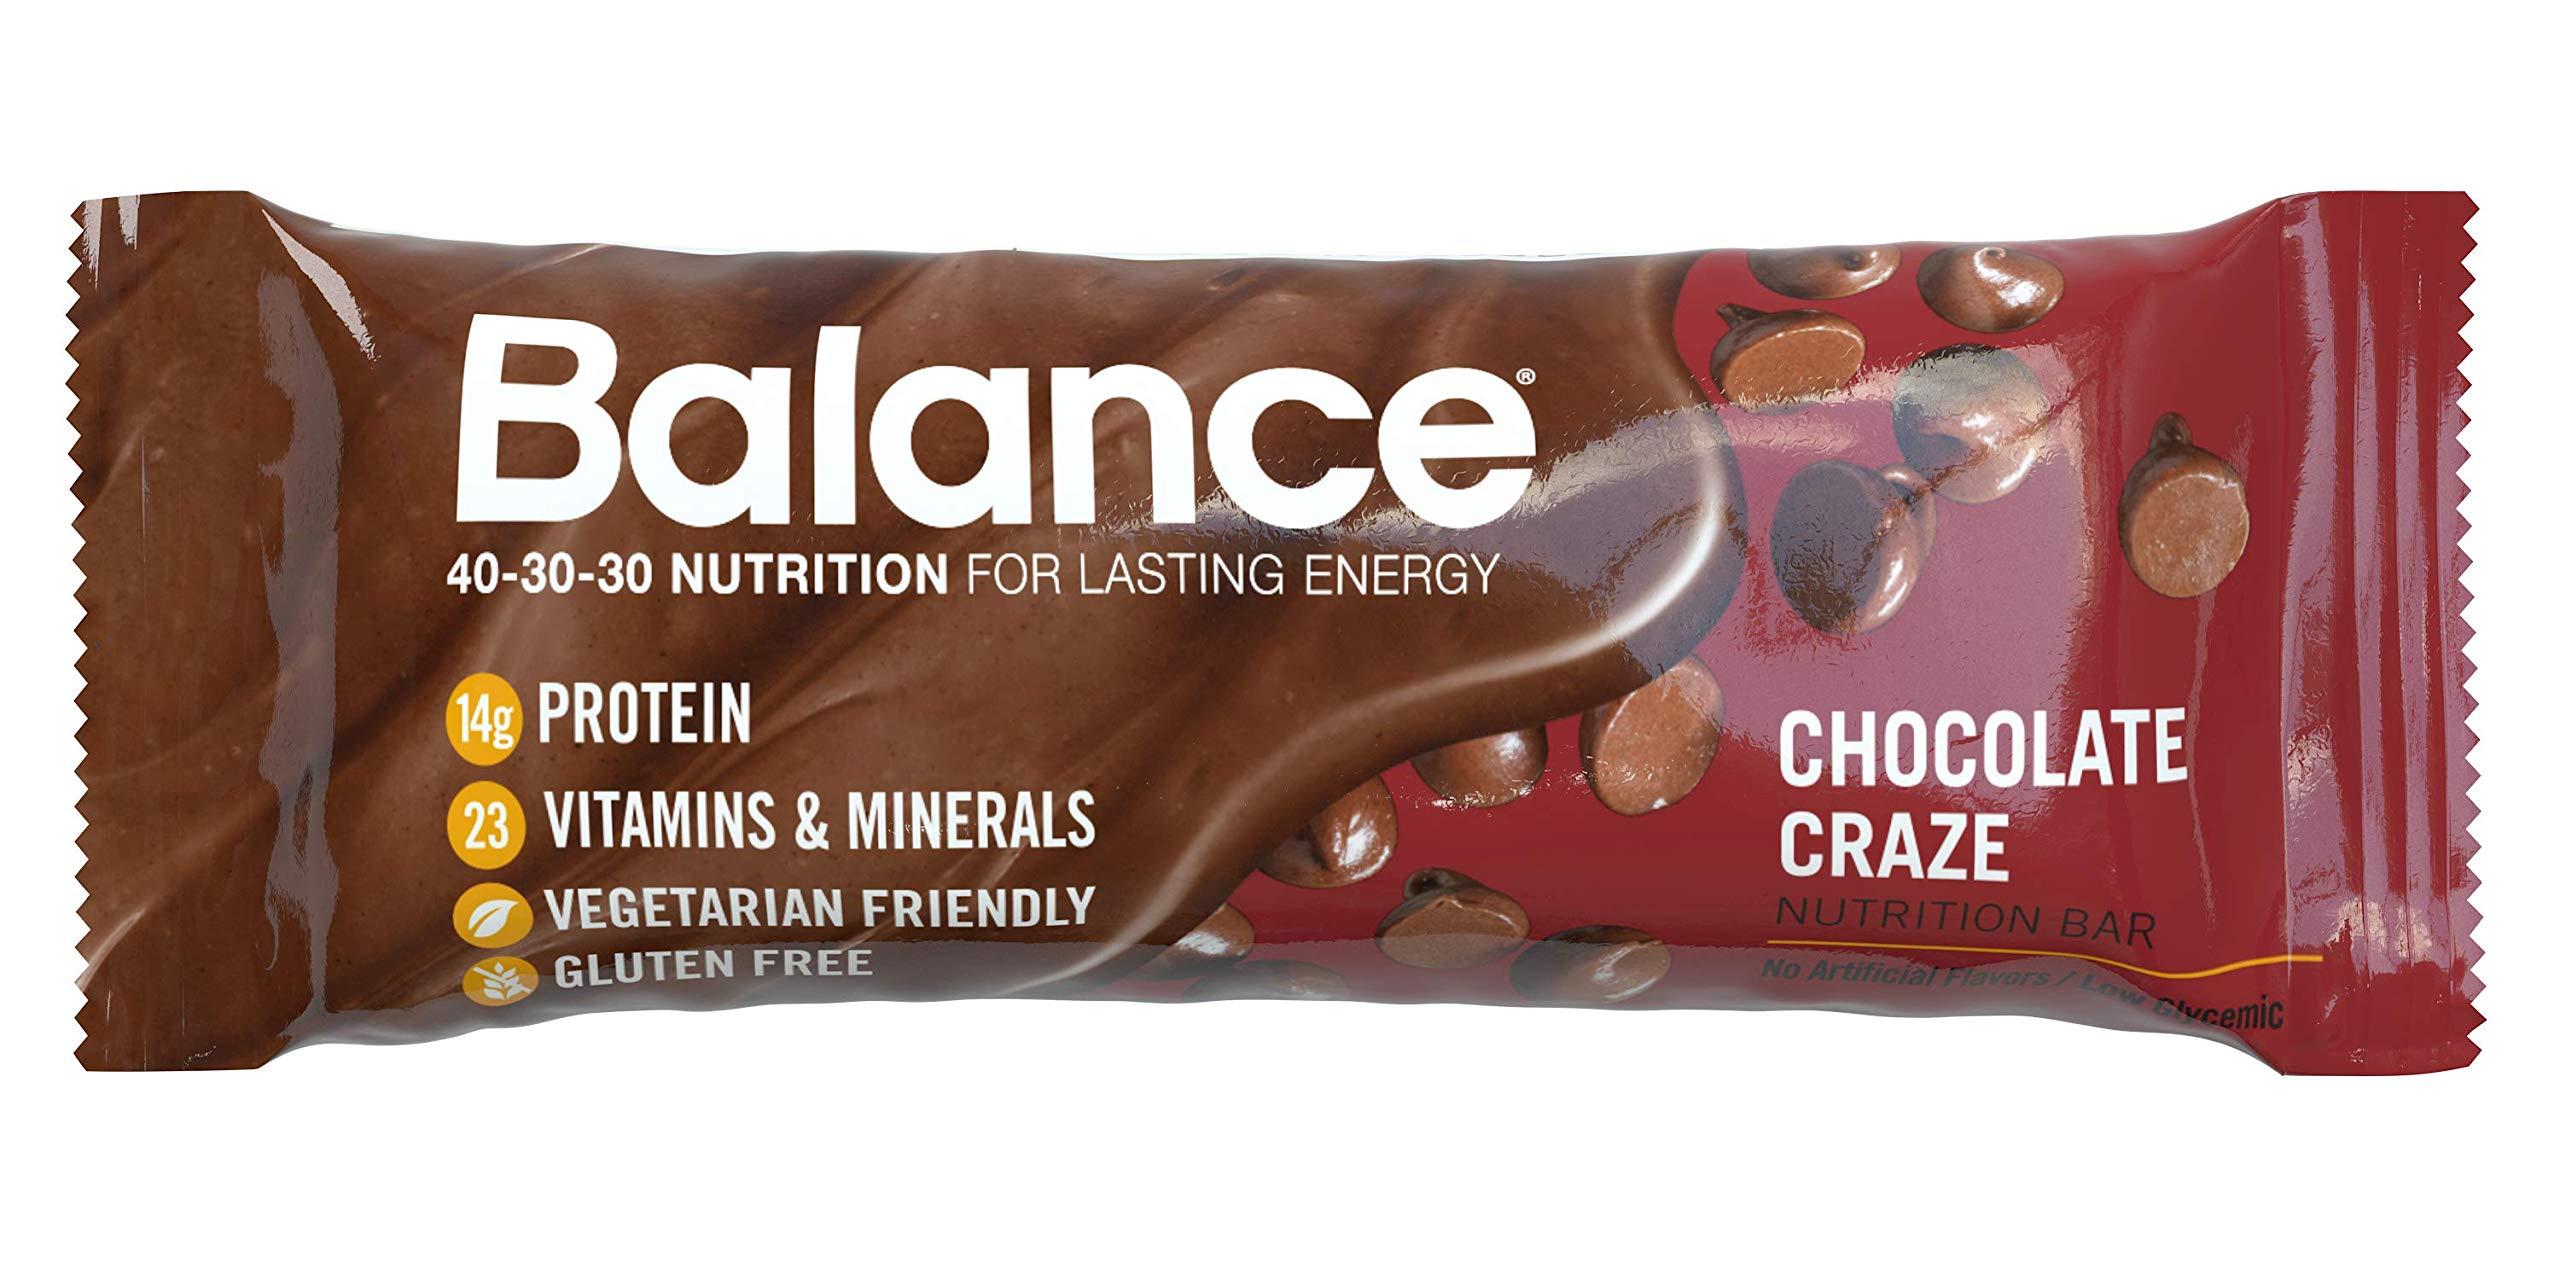 Balance Bar, Healthy Protein Snacks, Chocolate Craze, 1.76 oz, 6 Count by BALANCE Bar